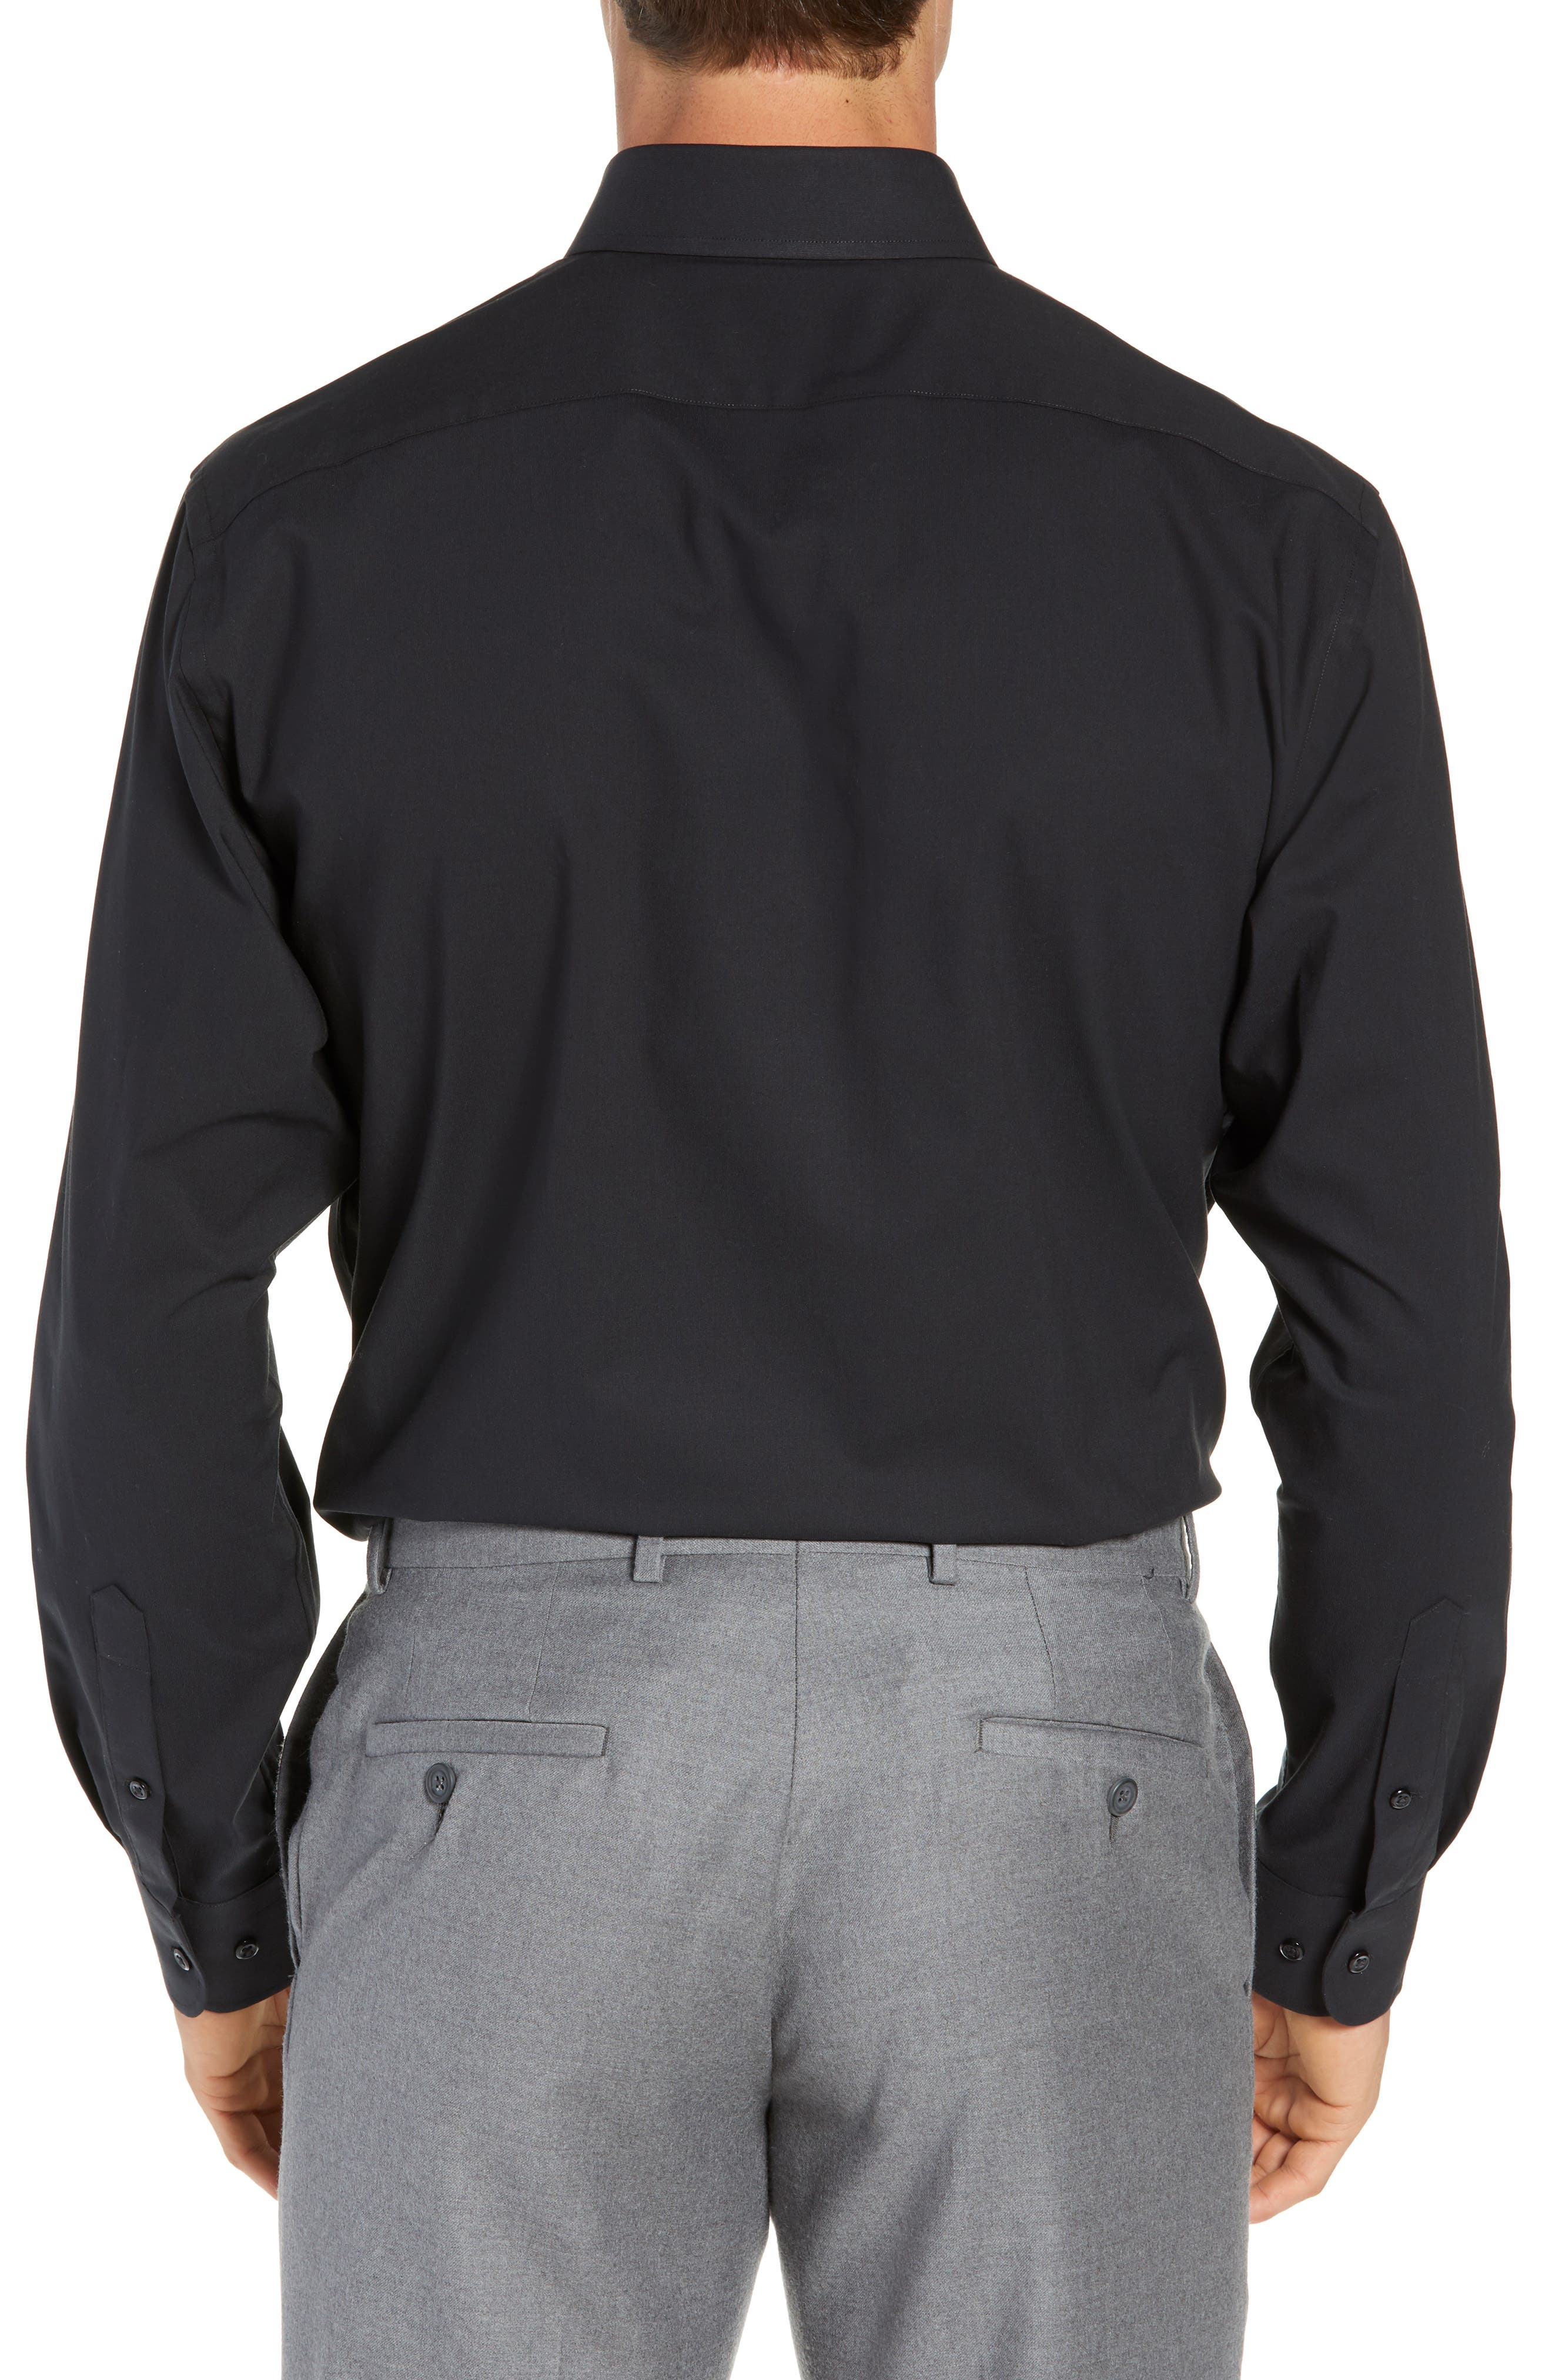 NORDSTROM MEN'S SHOP, Tech-Smart Traditional Fit Stretch Pinpoint Dress Shirt, Alternate thumbnail 3, color, BLACK ROCK